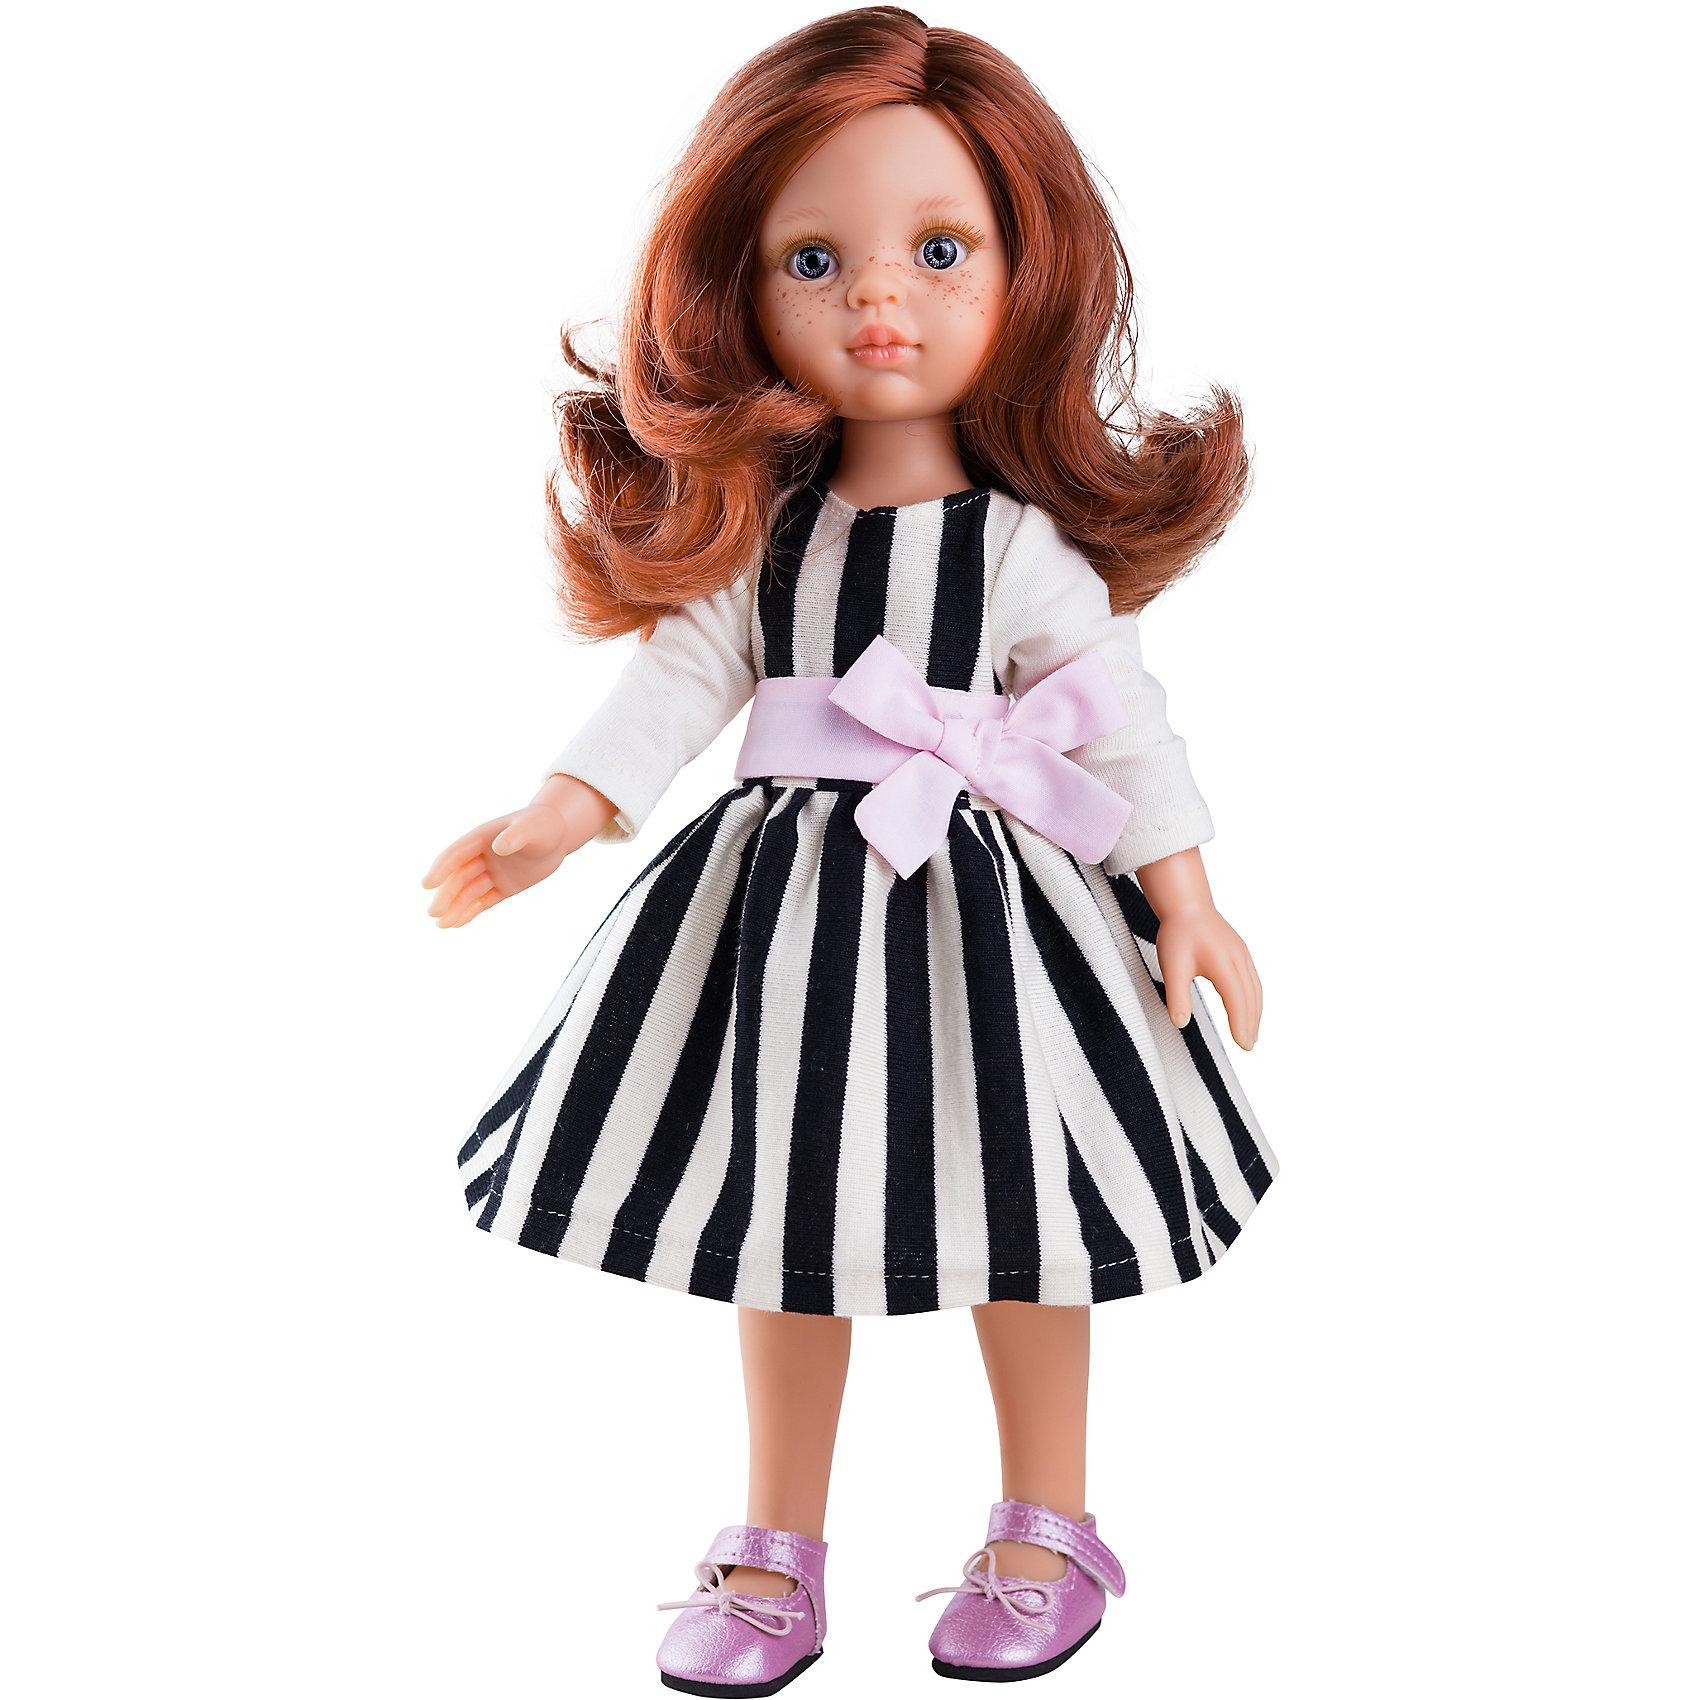 Кукла Кристи, 32 см, Paola ReinaКлассические куклы<br><br><br>Ширина мм: 375<br>Глубина мм: 175<br>Высота мм: 105<br>Вес г: 625<br>Возраст от месяцев: 36<br>Возраст до месяцев: 144<br>Пол: Женский<br>Возраст: Детский<br>SKU: 6671054